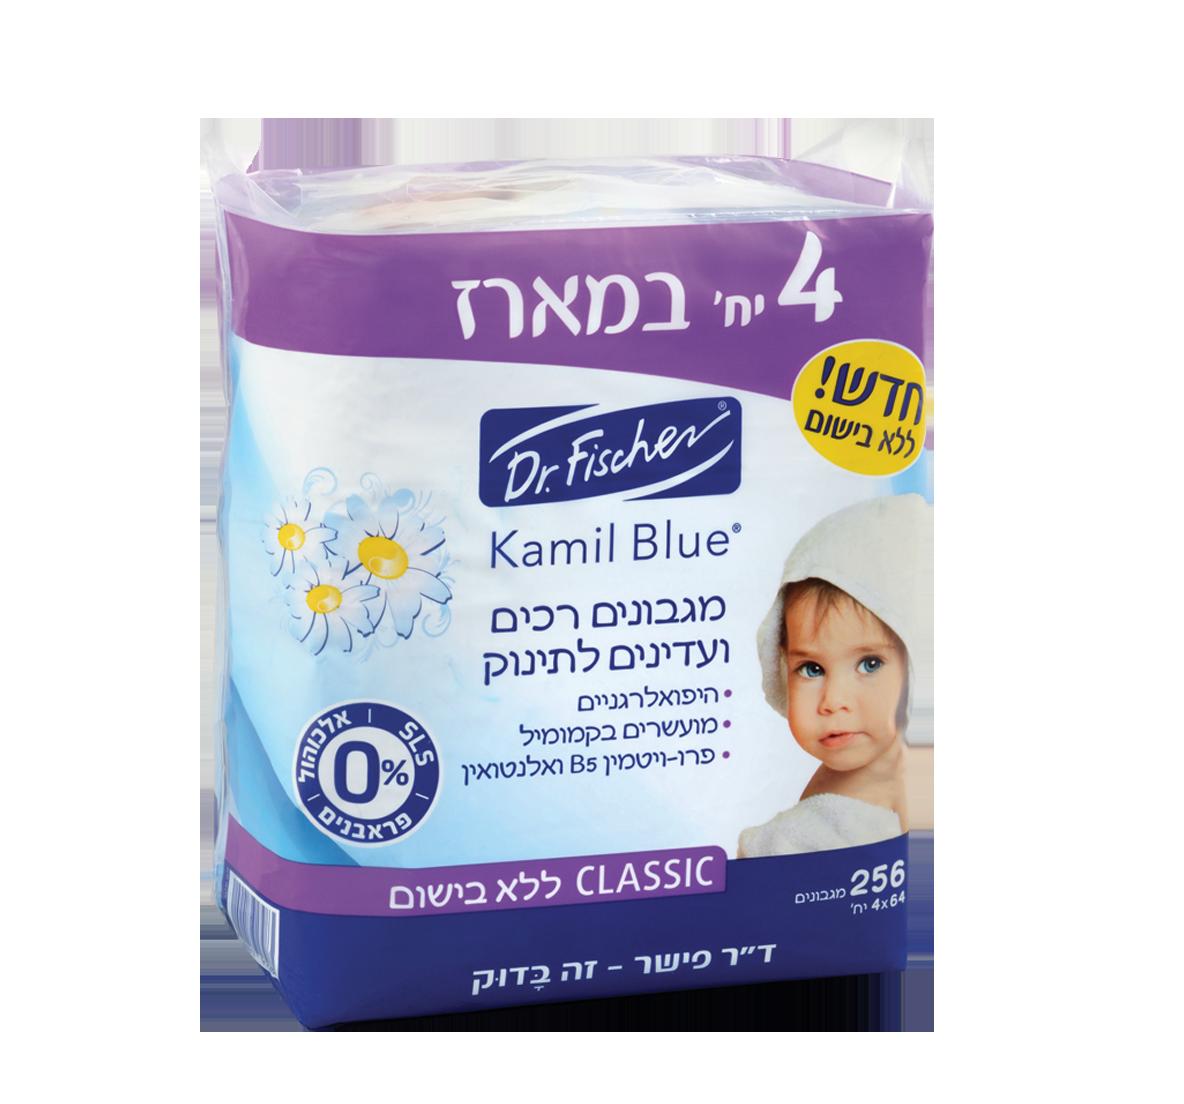 E_kamil-blue_4_wipes_40_no-parfum_kit_1184x1104